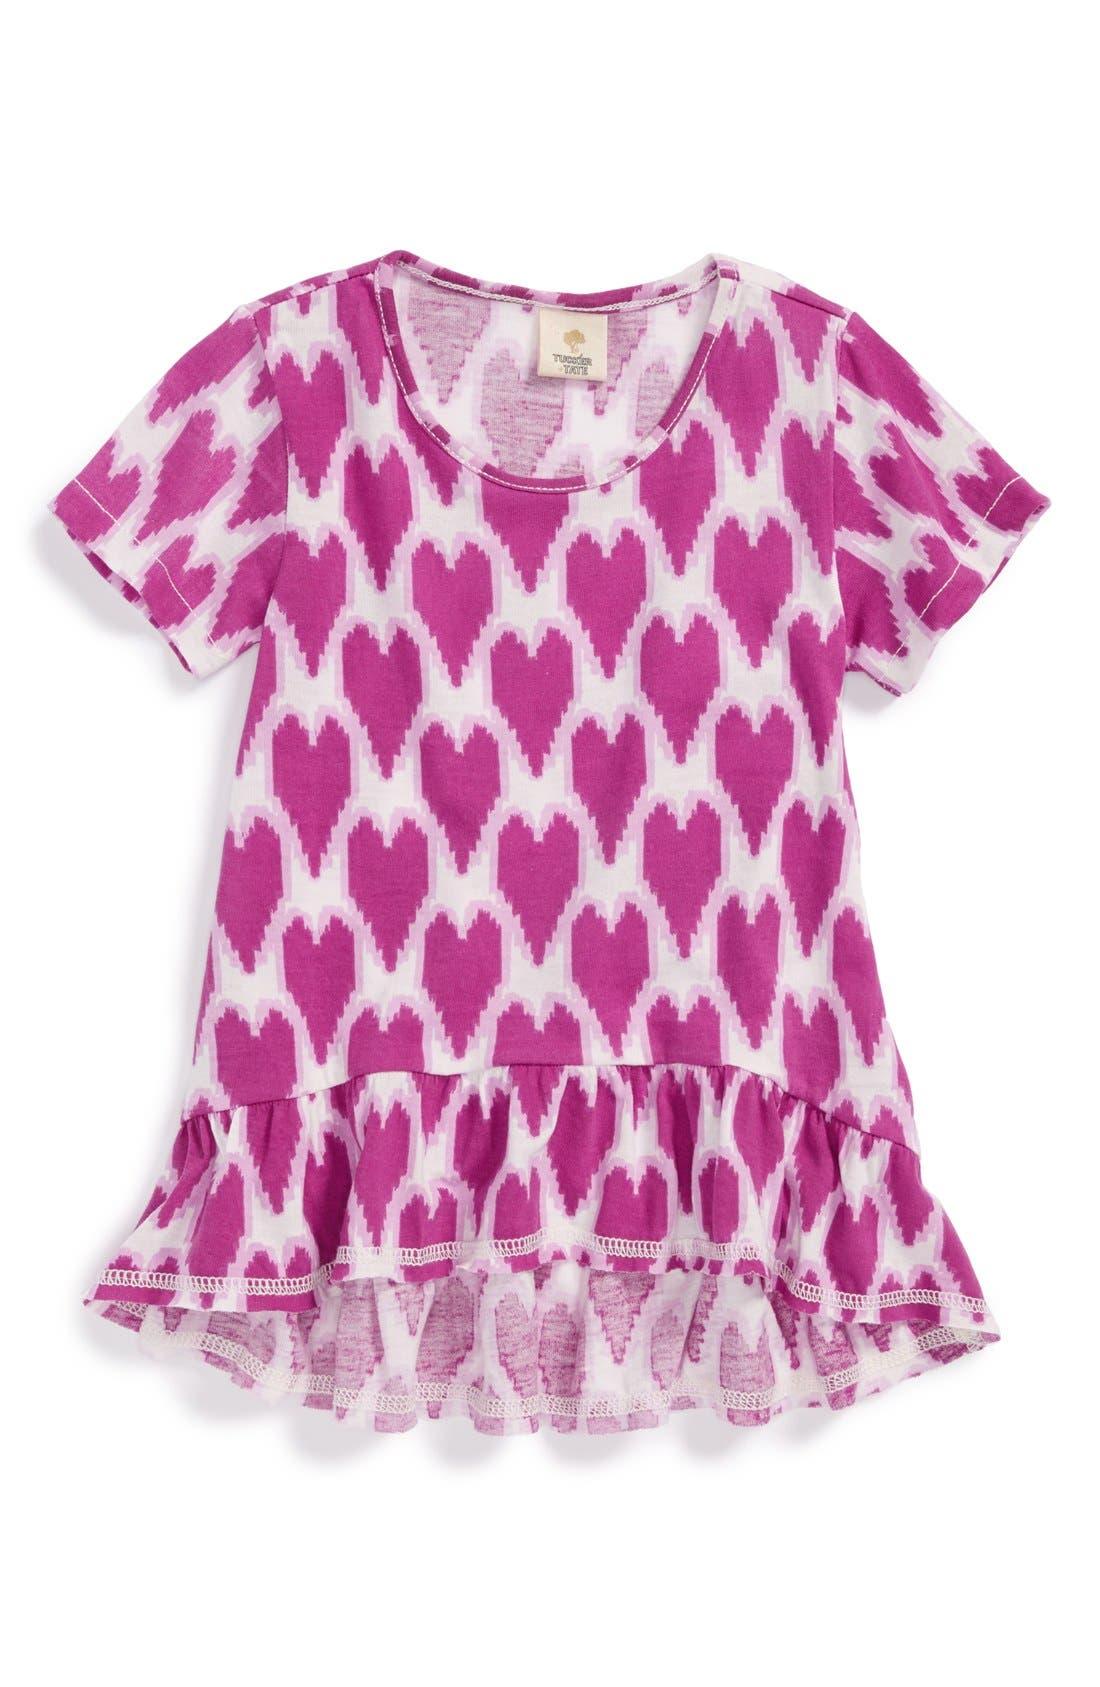 Main Image - Tucker + Tate 'Maiko' Print Top (Toddler Girls, Little Girls & Big Girls)